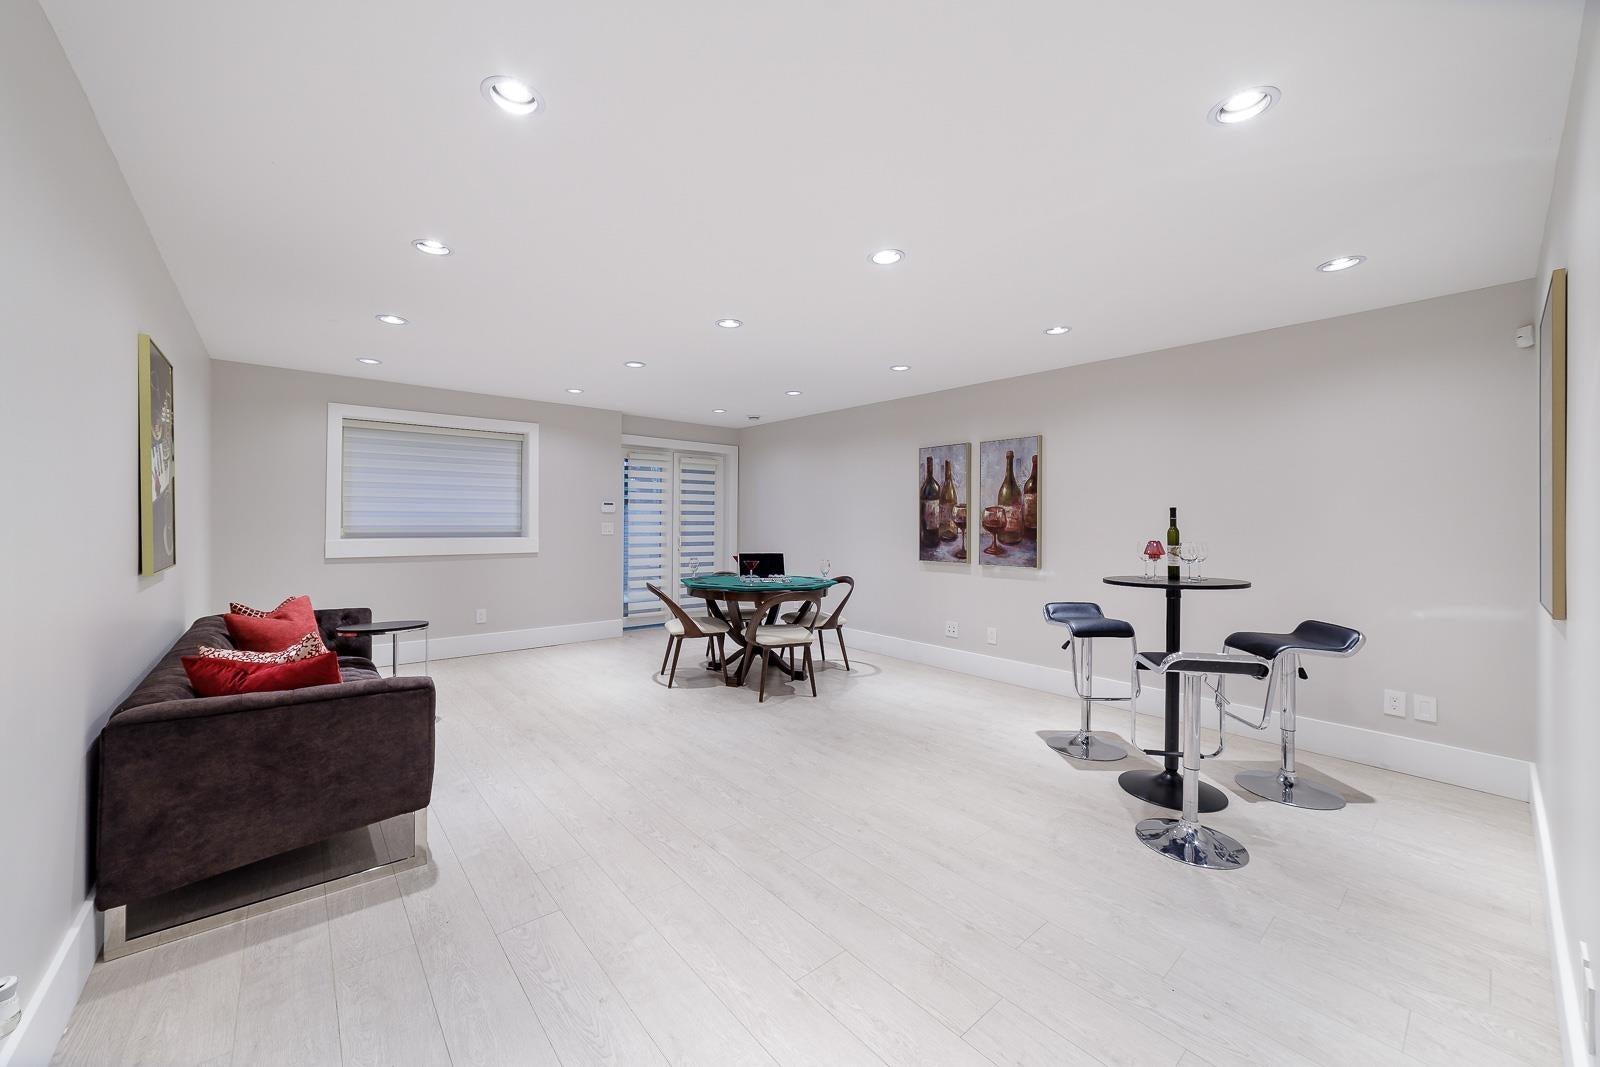 517 GRANADA CRESCENT - Upper Delbrook House/Single Family for sale, 8 Bedrooms (R2615057) - #25